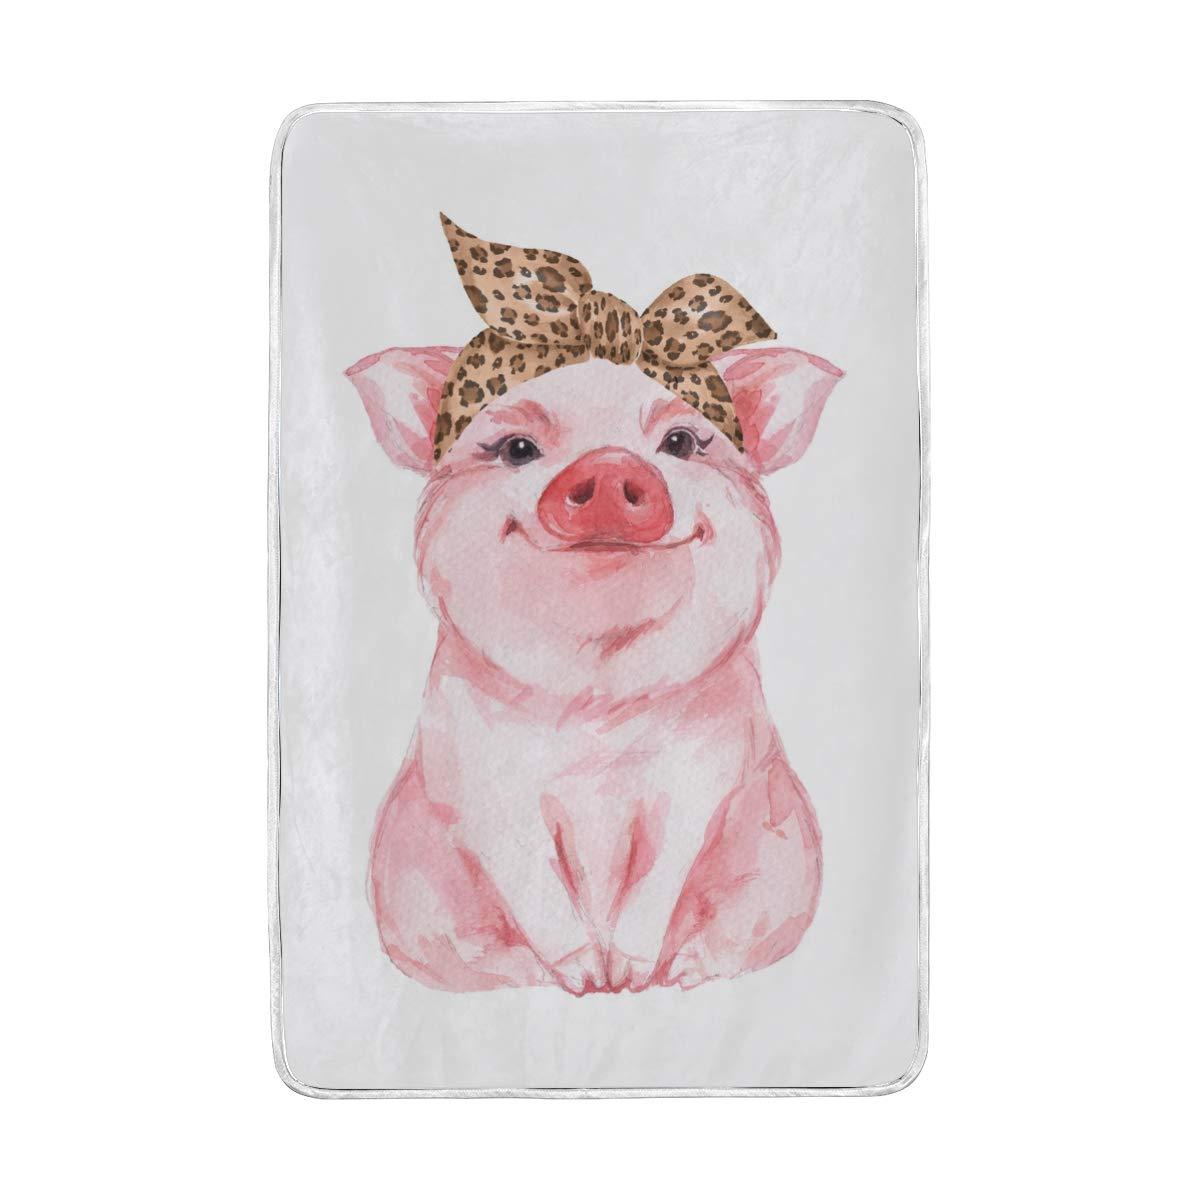 Vantaso Soft Blankets Throw Cute Girl Pig Pink Kids Girls Boys Bedroom Sofa Couch Living Room 60 x 90 inch by Vantaso